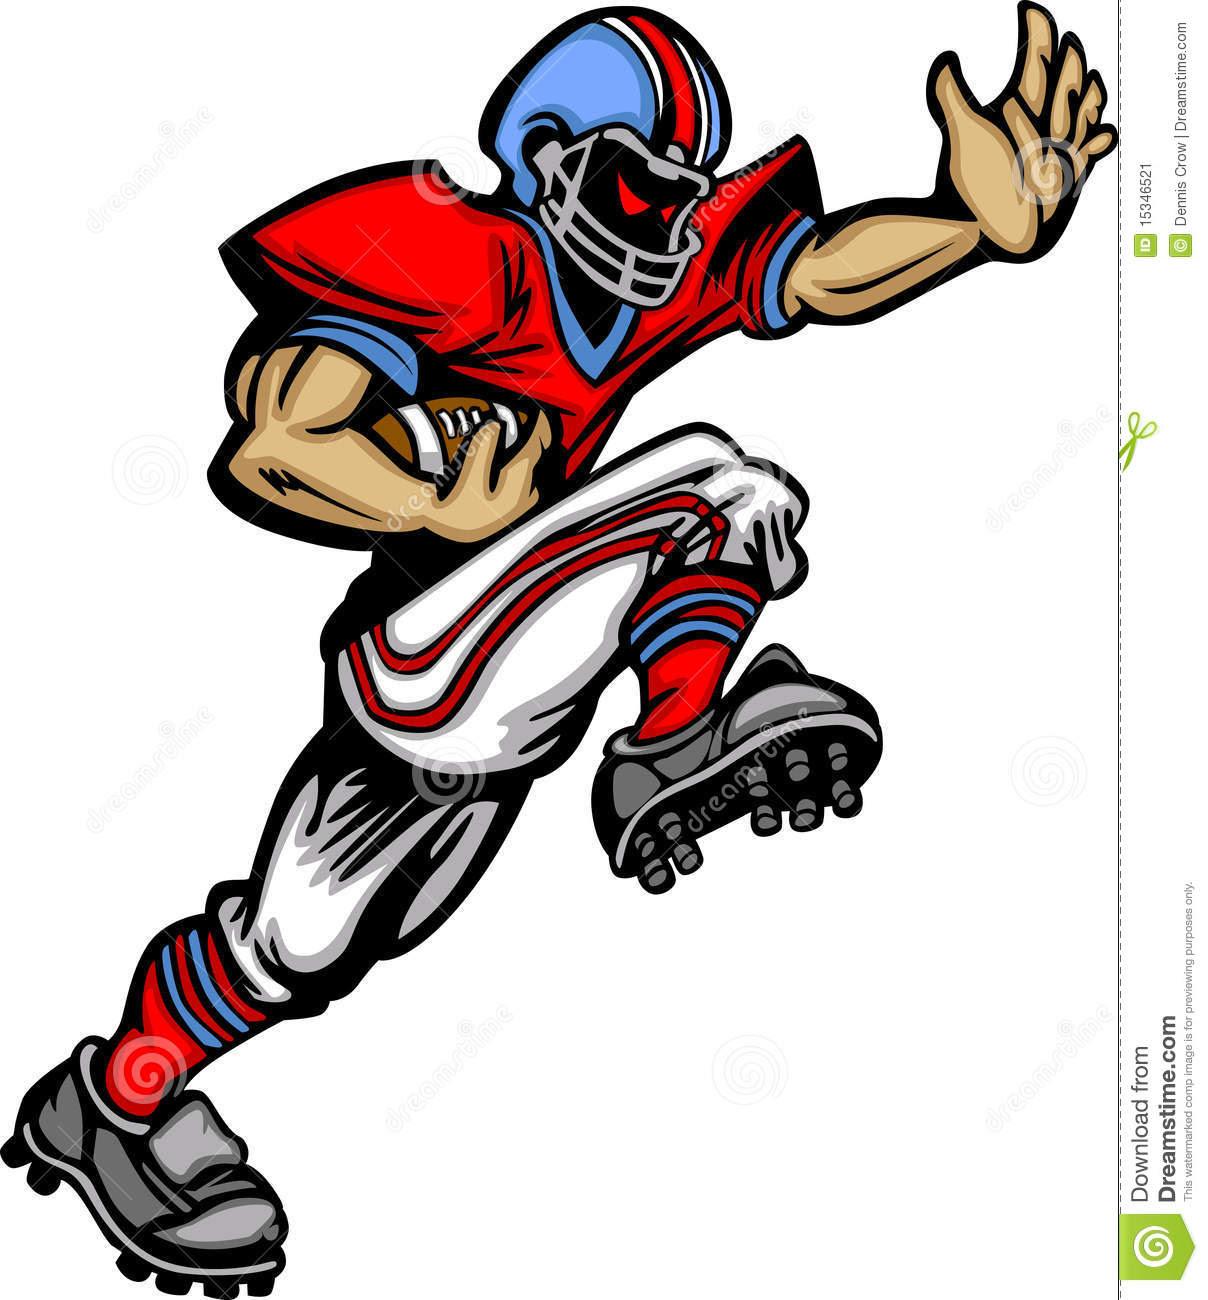 Cartoon Nfl Football Players